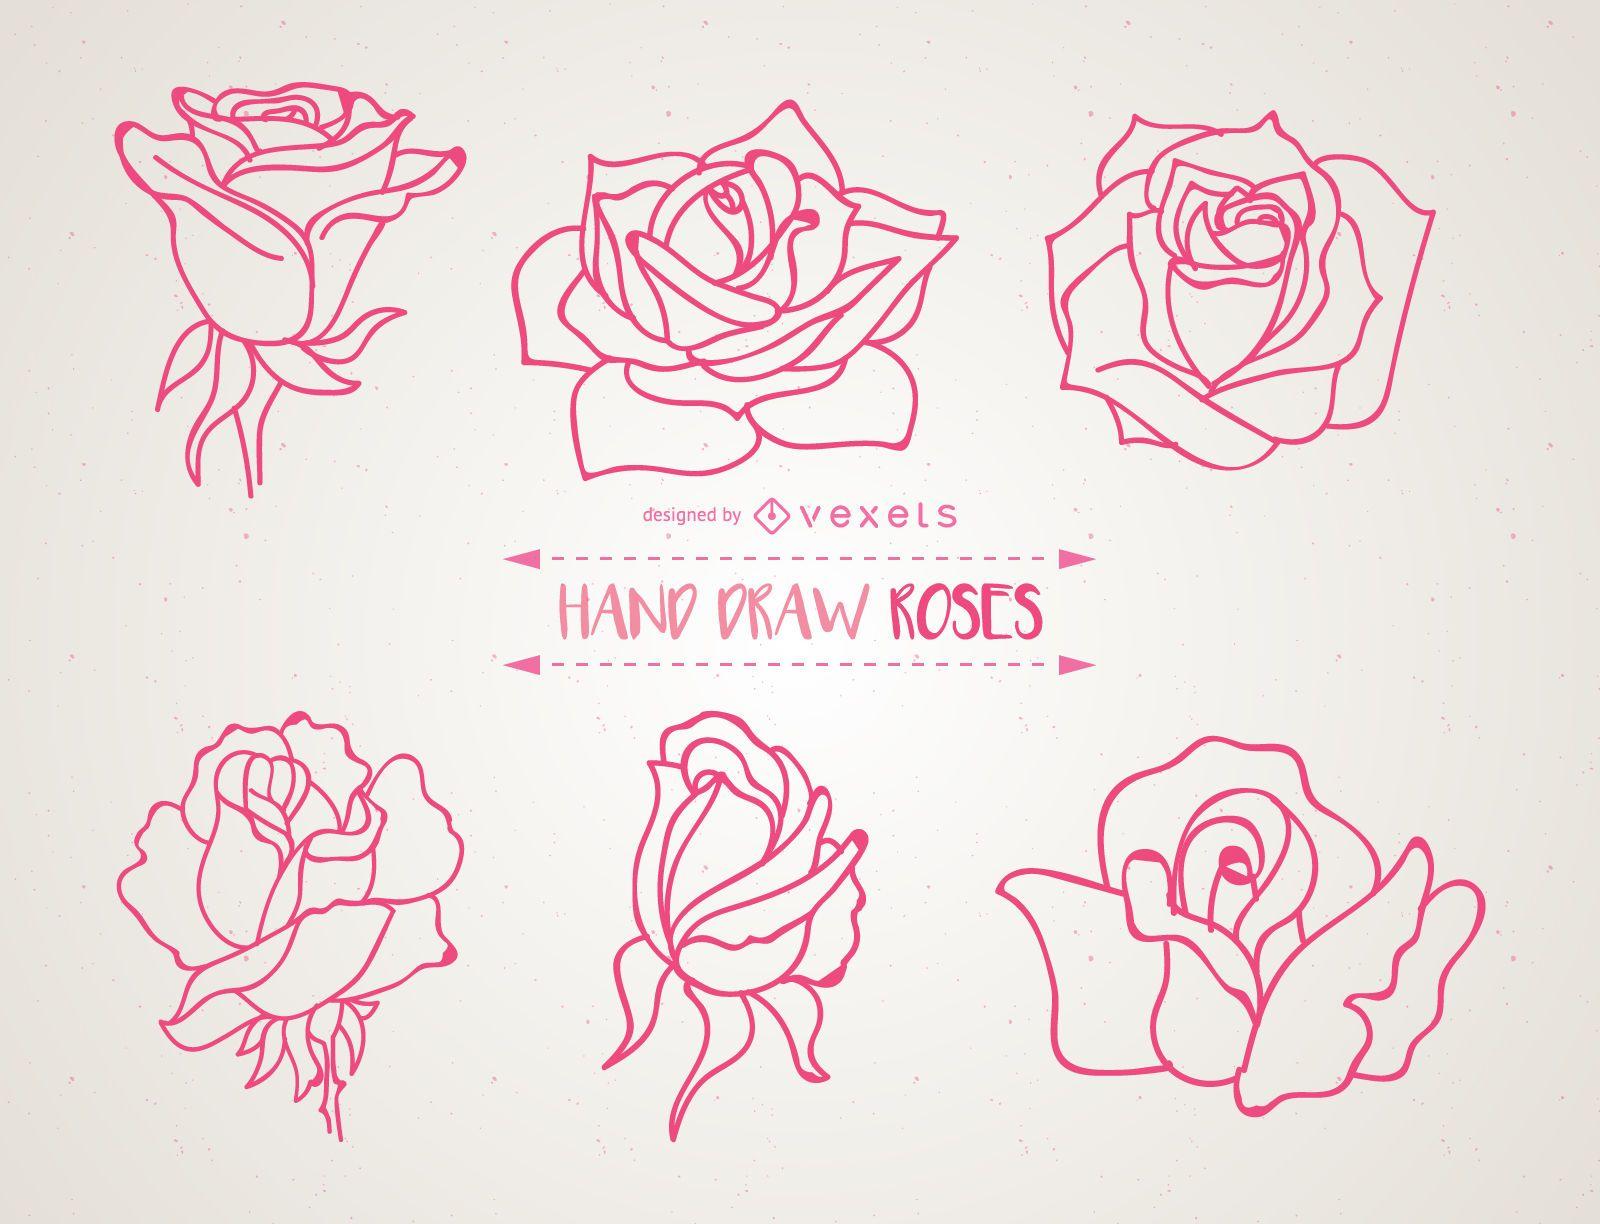 Set of hand drawn roses illustrations